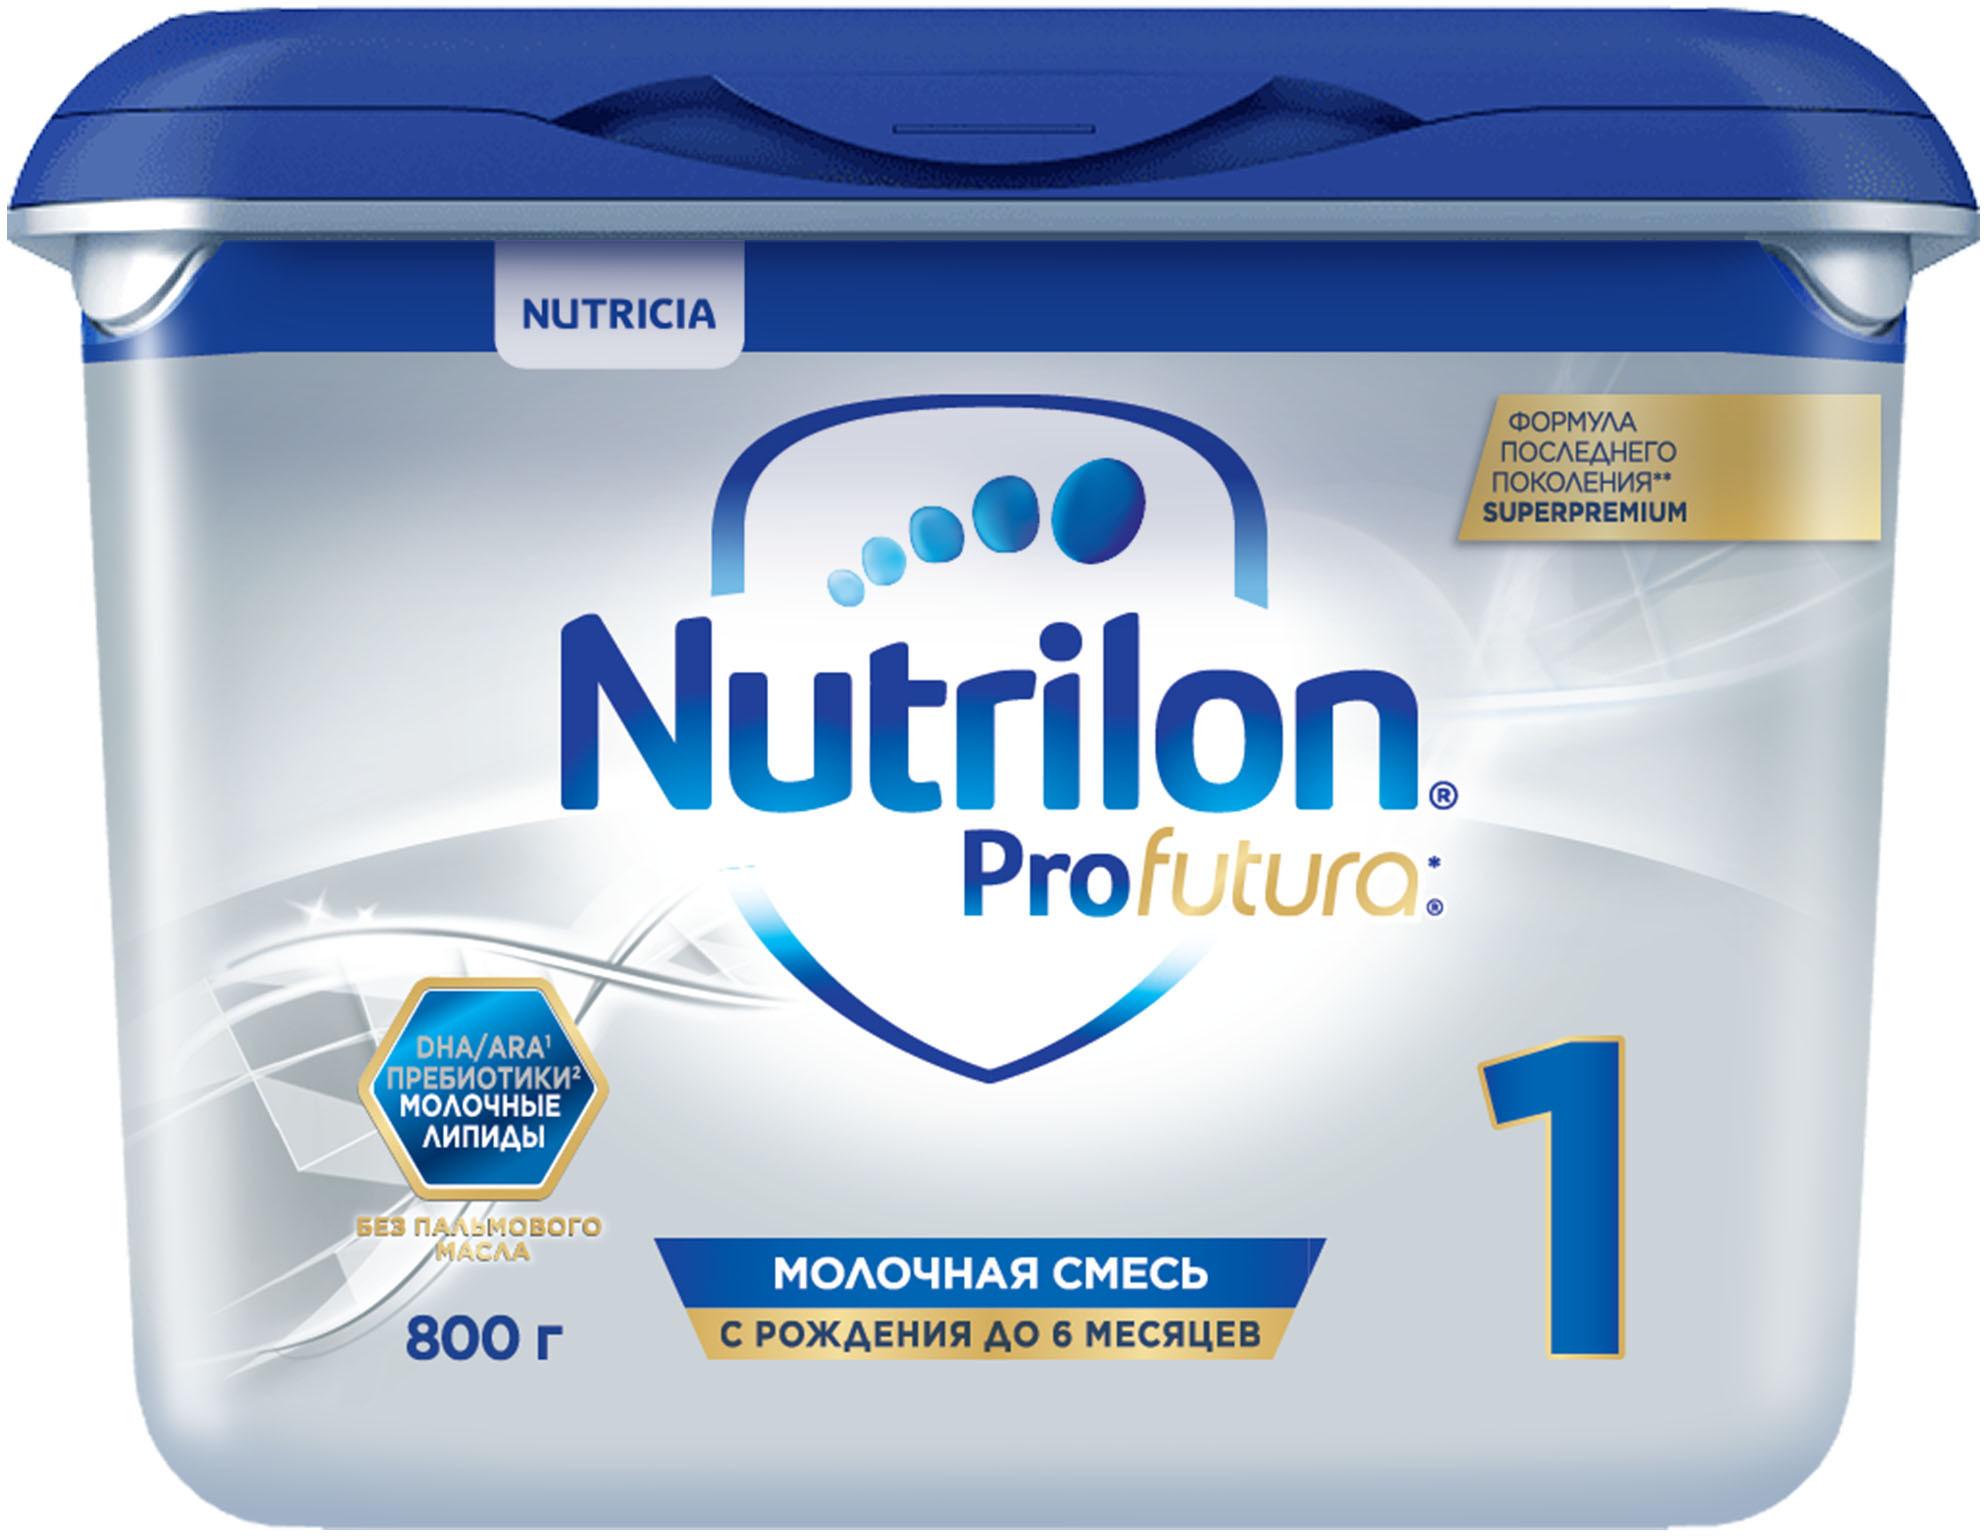 Молочная смесь Nutrilon Nutrilon (Nutricia) 1 Superpremium ProFutura (c рождения) 800 г молочная смесь nutricia nutrilon nutricia 2 premium c 6 месяцев 800 г